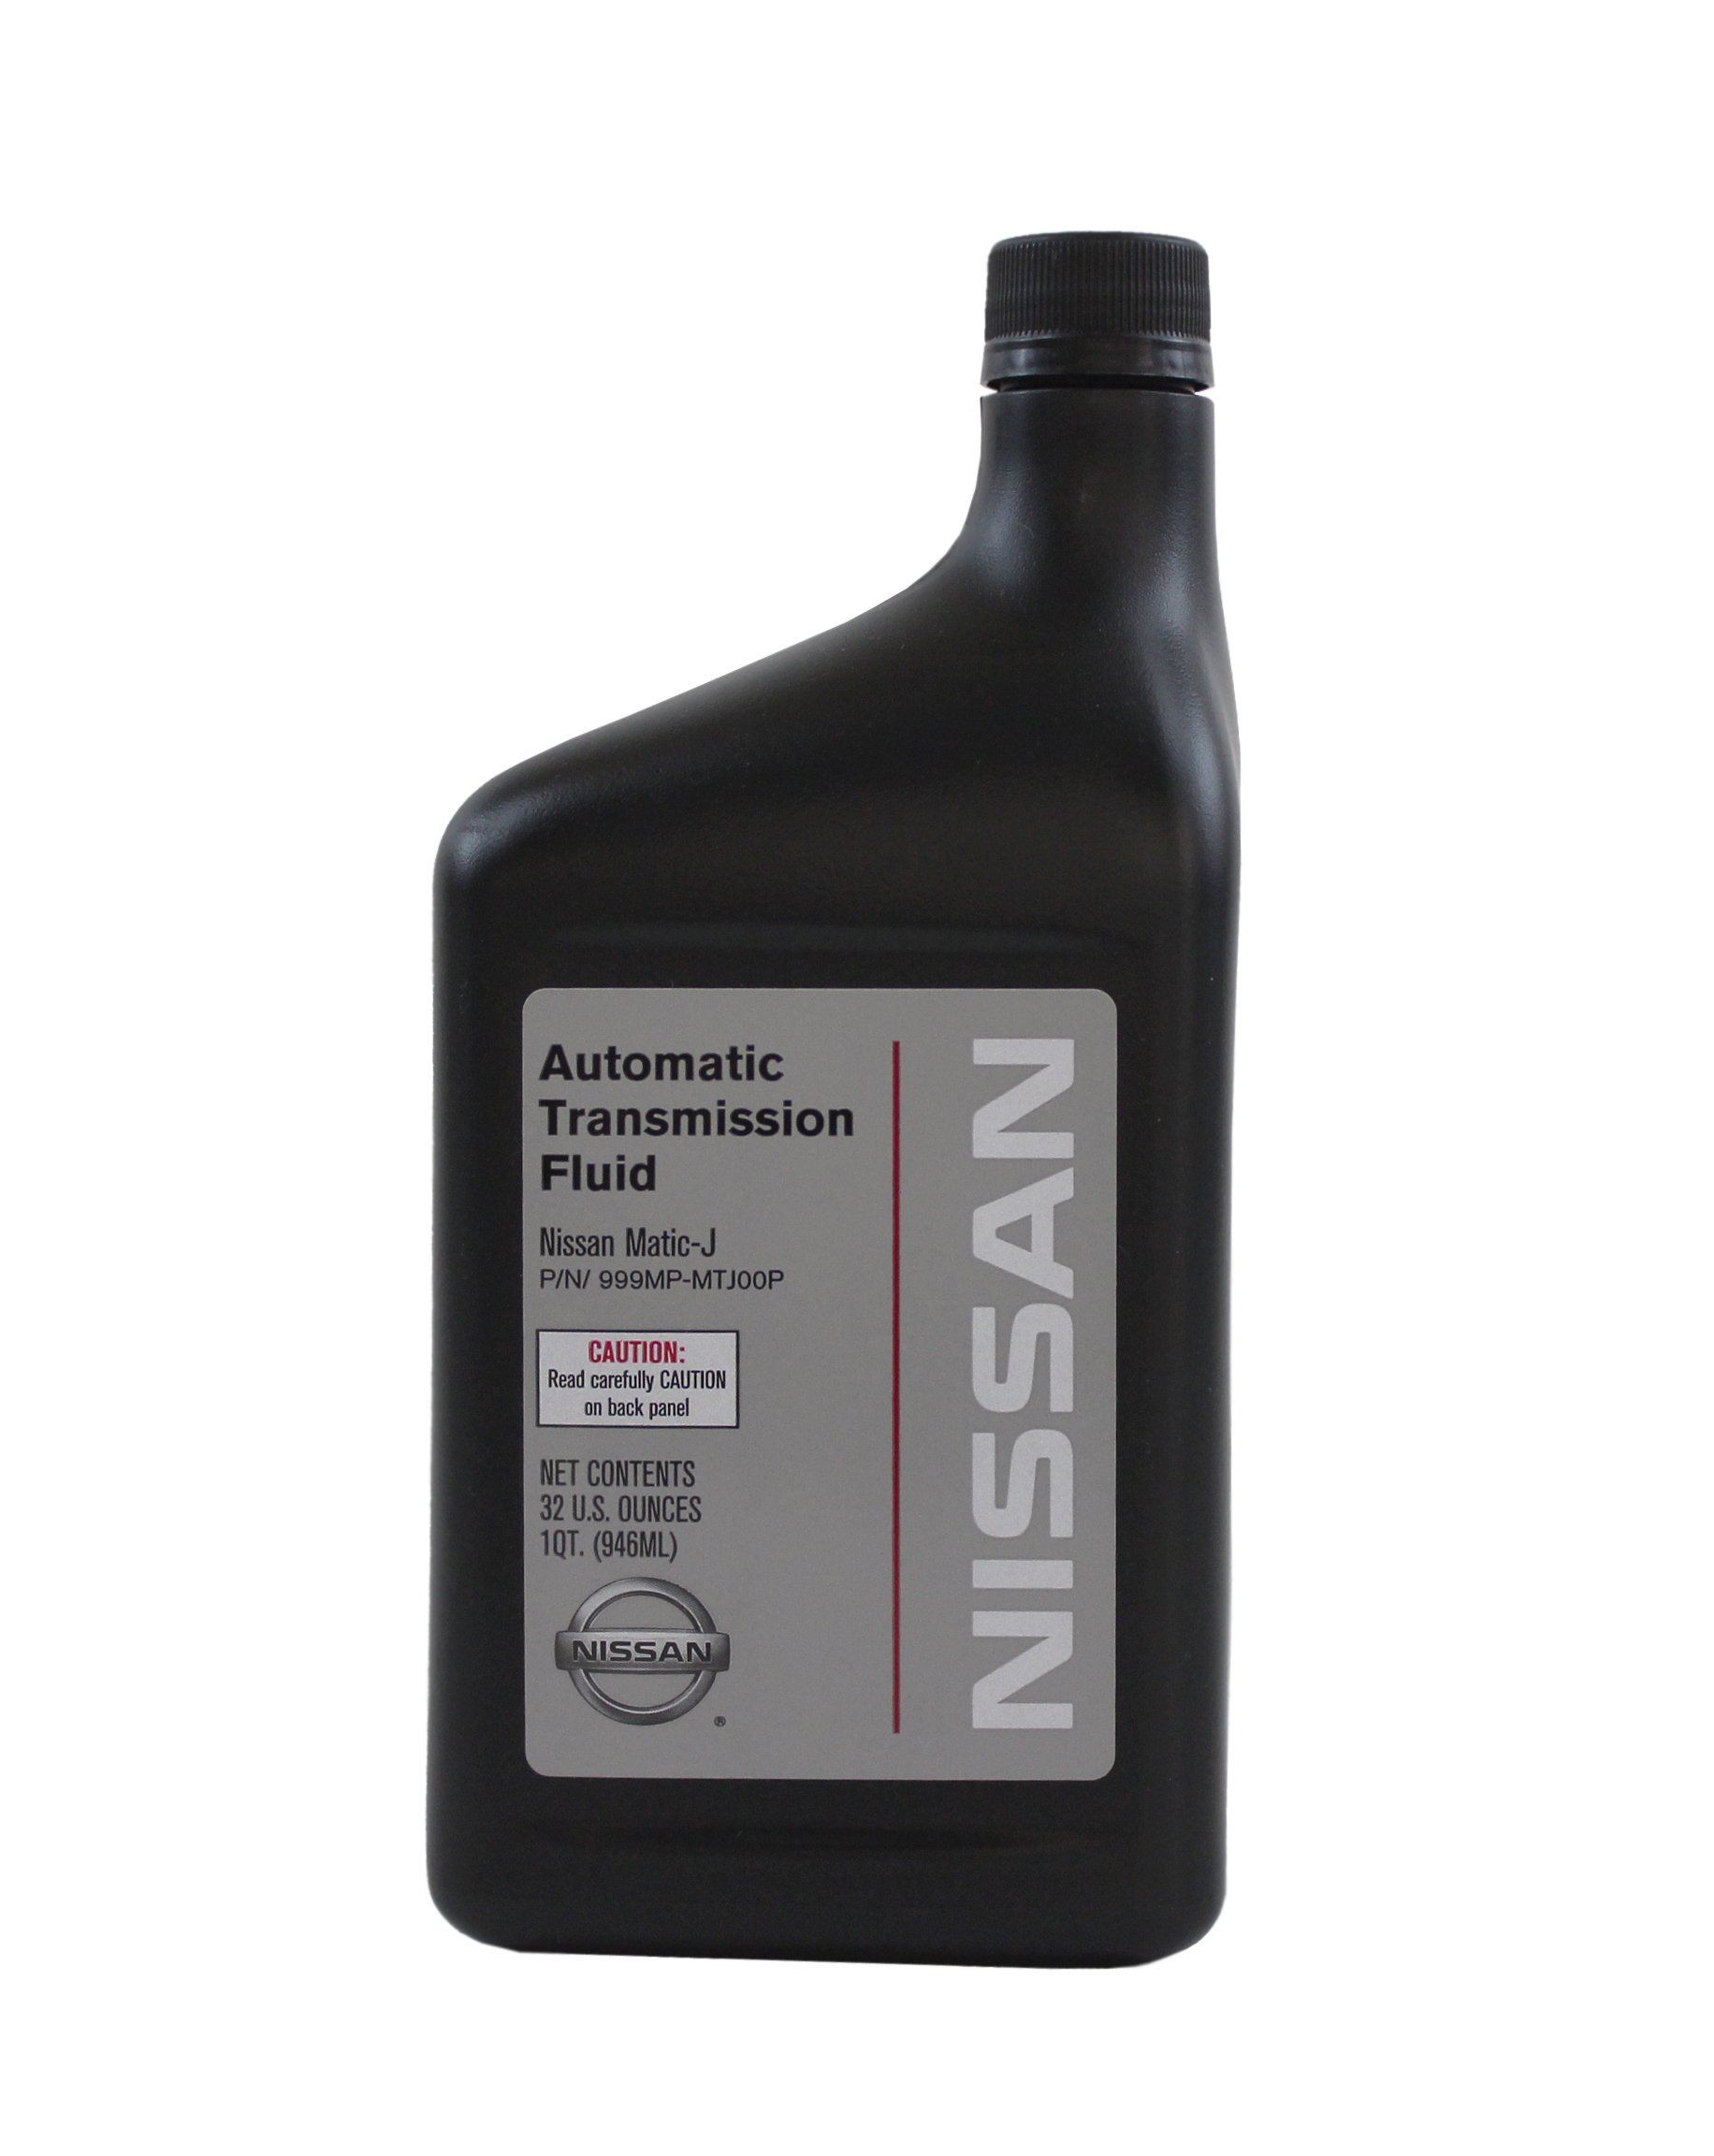 Nissan Genuine Fluid 999MP-MTJ00P Matic-J Automatic Transmission Fluid - 1 Quart